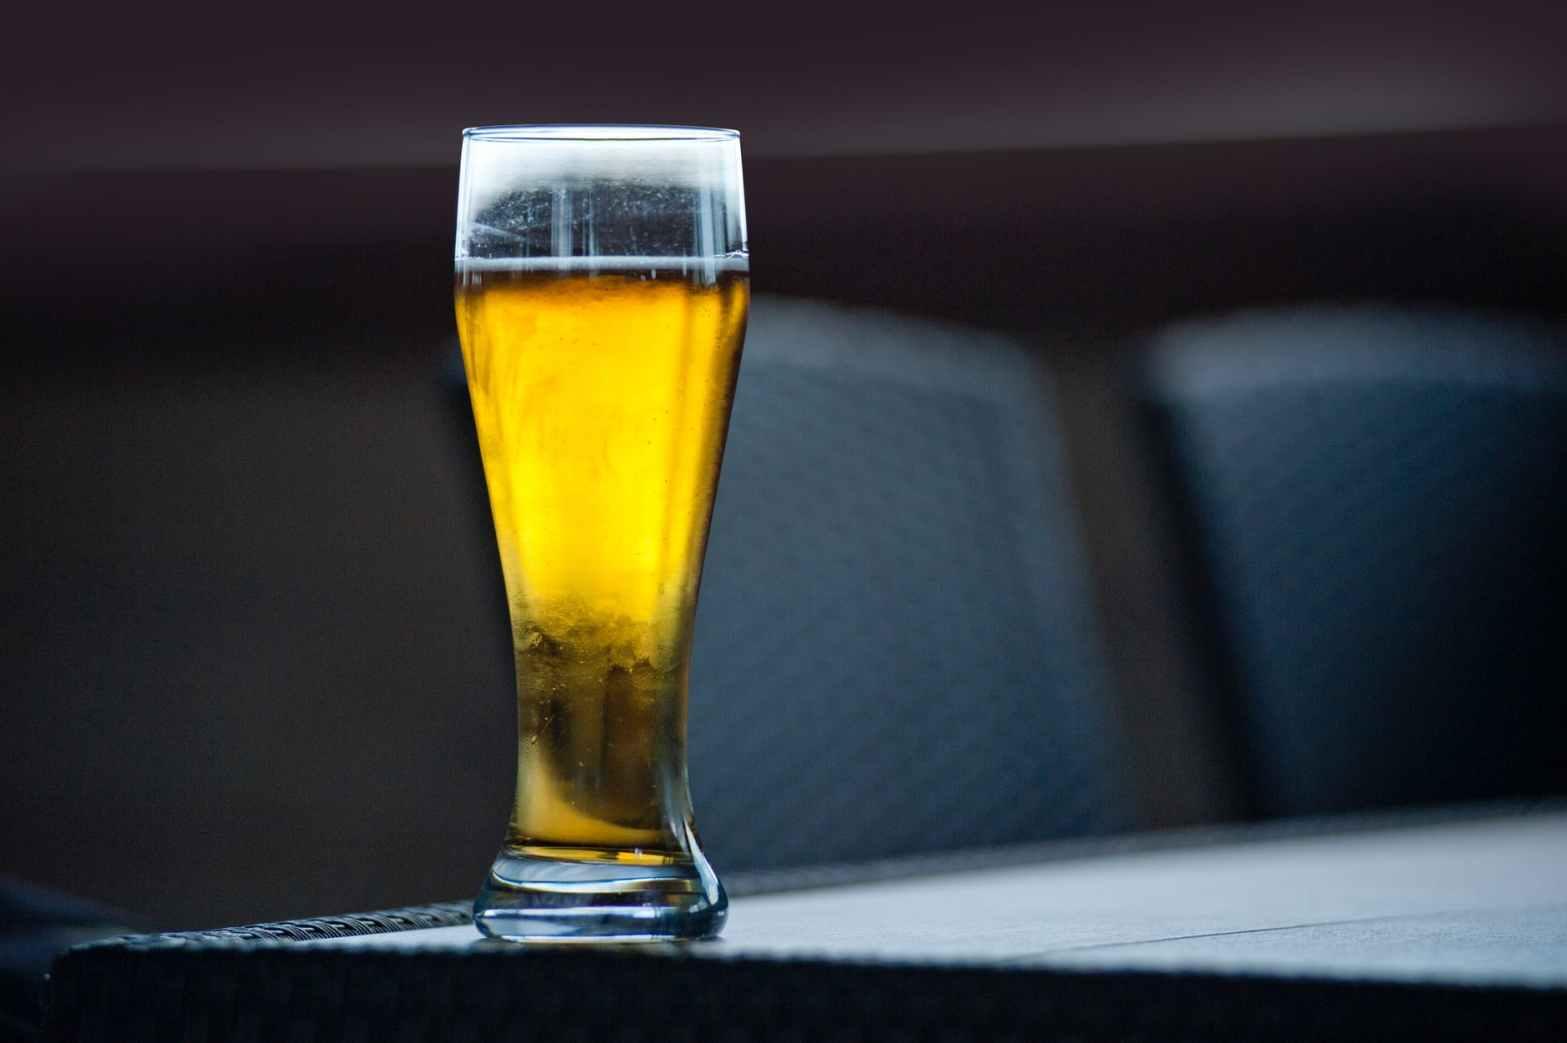 En svalkande Mythos beer, grekisk ljus lager öl